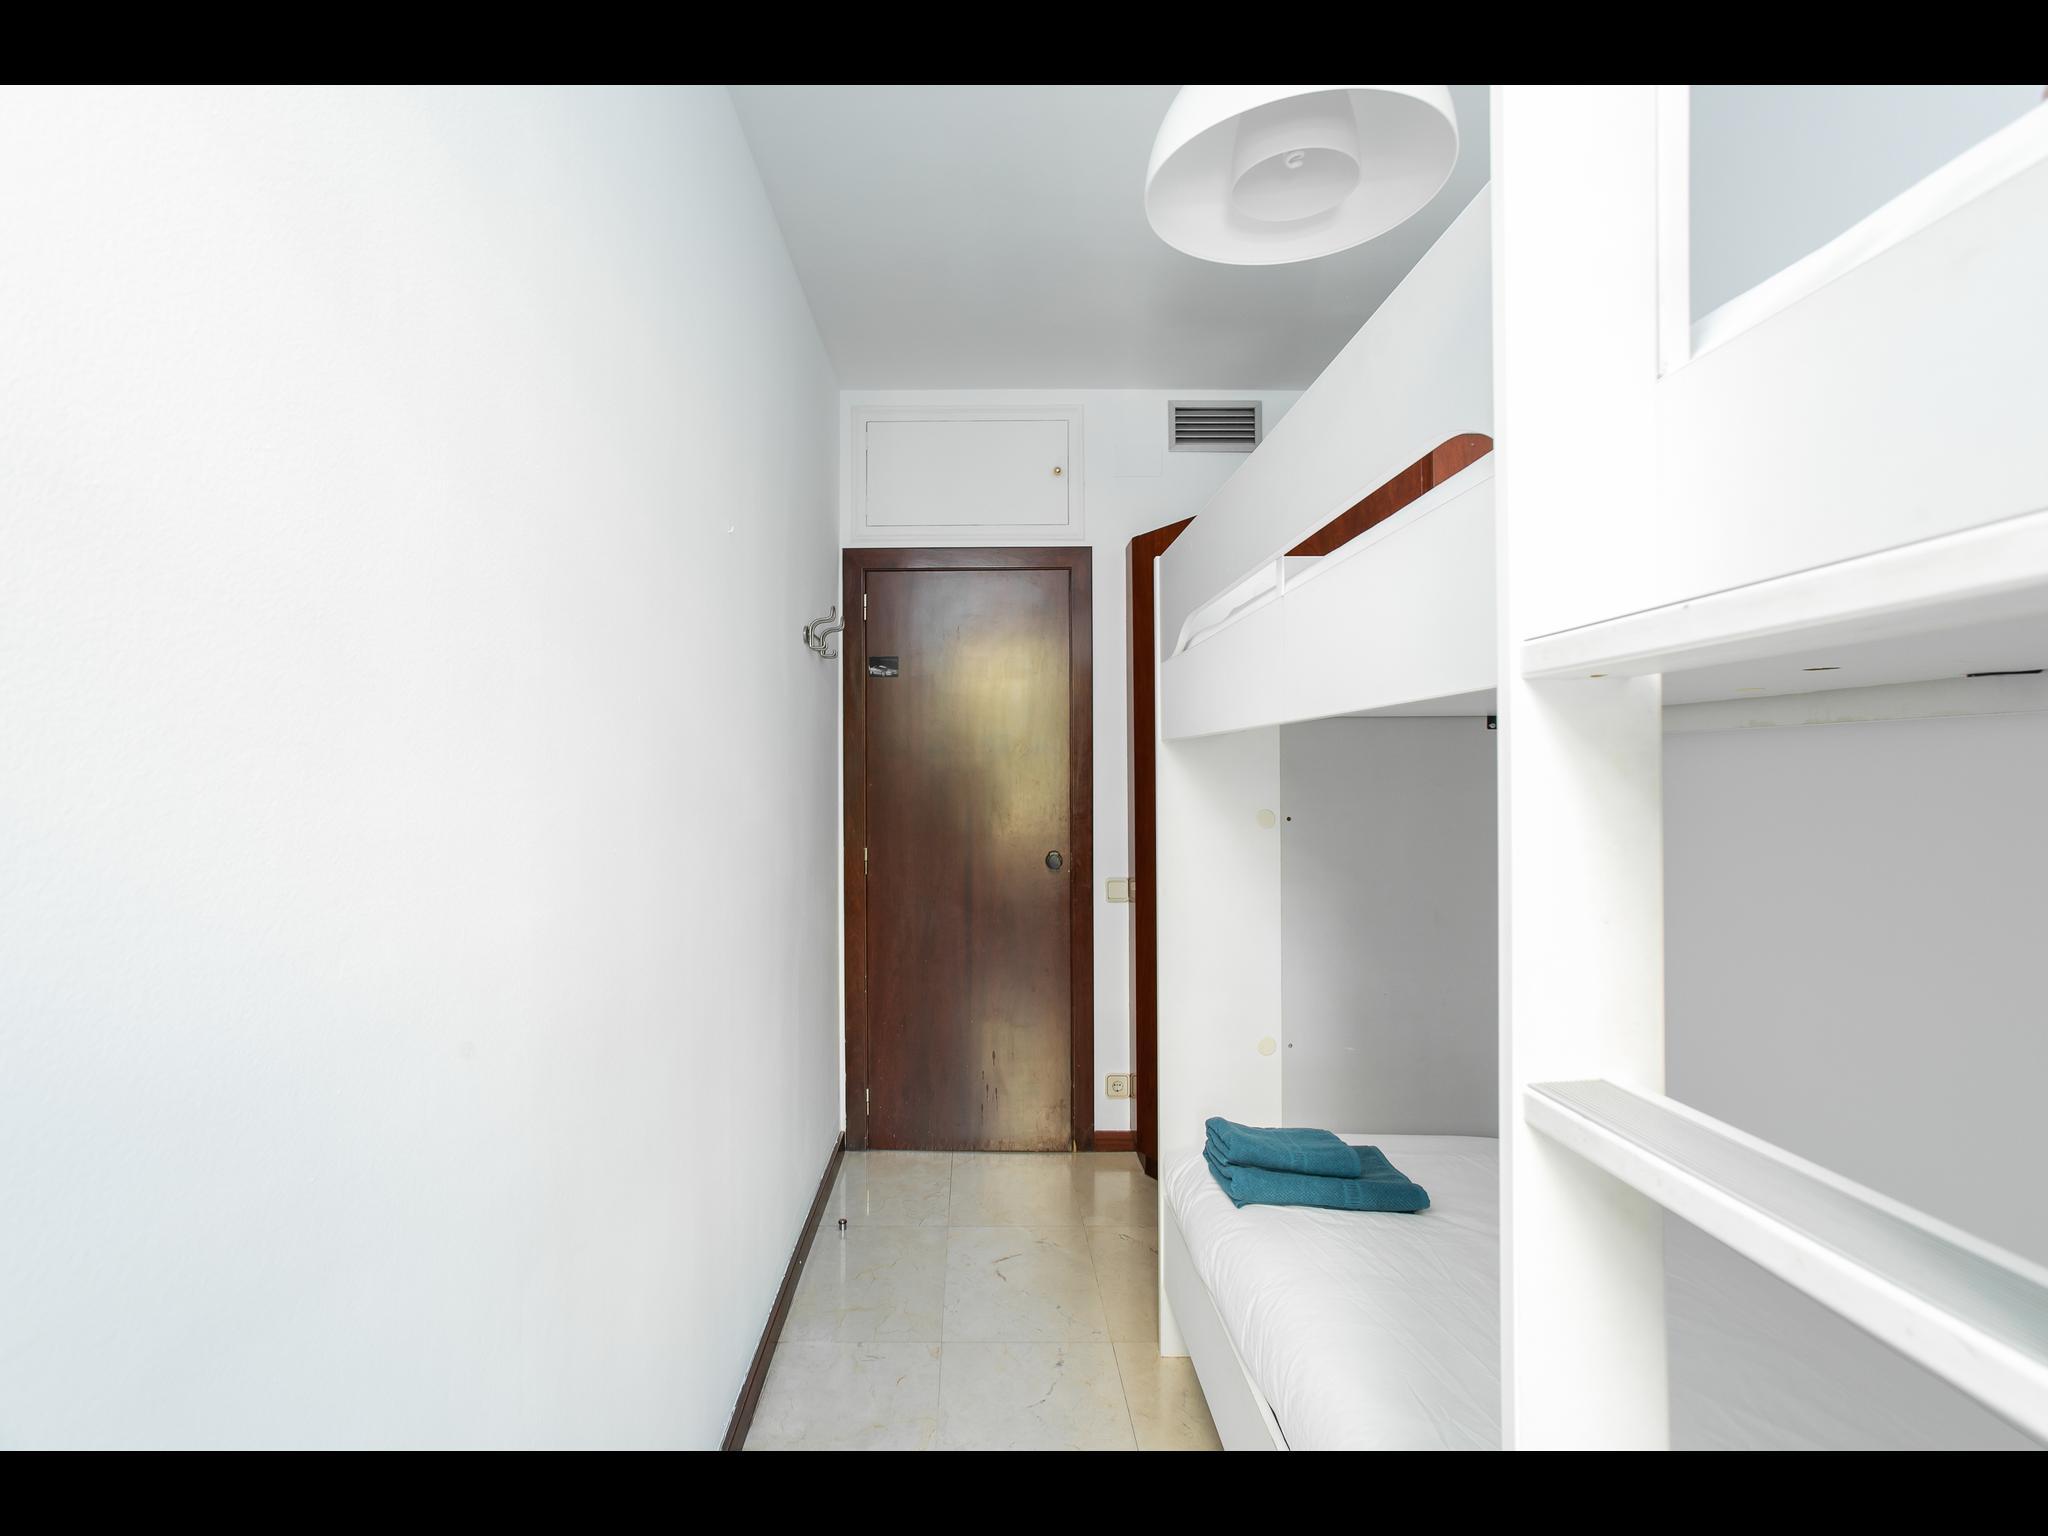 Diputacio - Furnished apartment in Barcelona